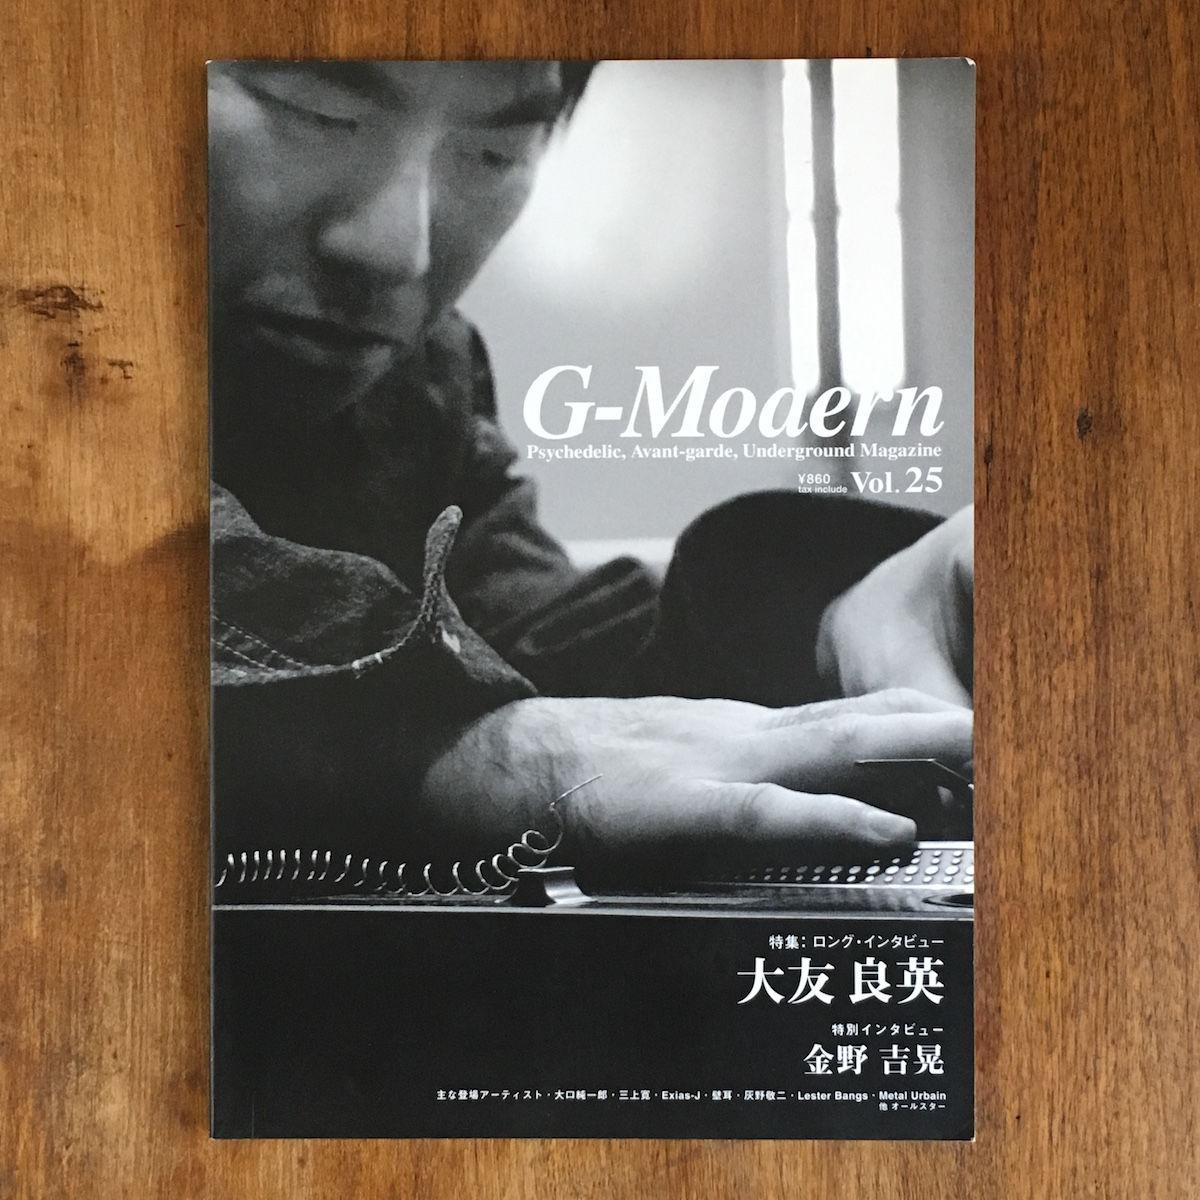 「G-Modern Vol.25(特集:大友良英ロング・インタビュー)」